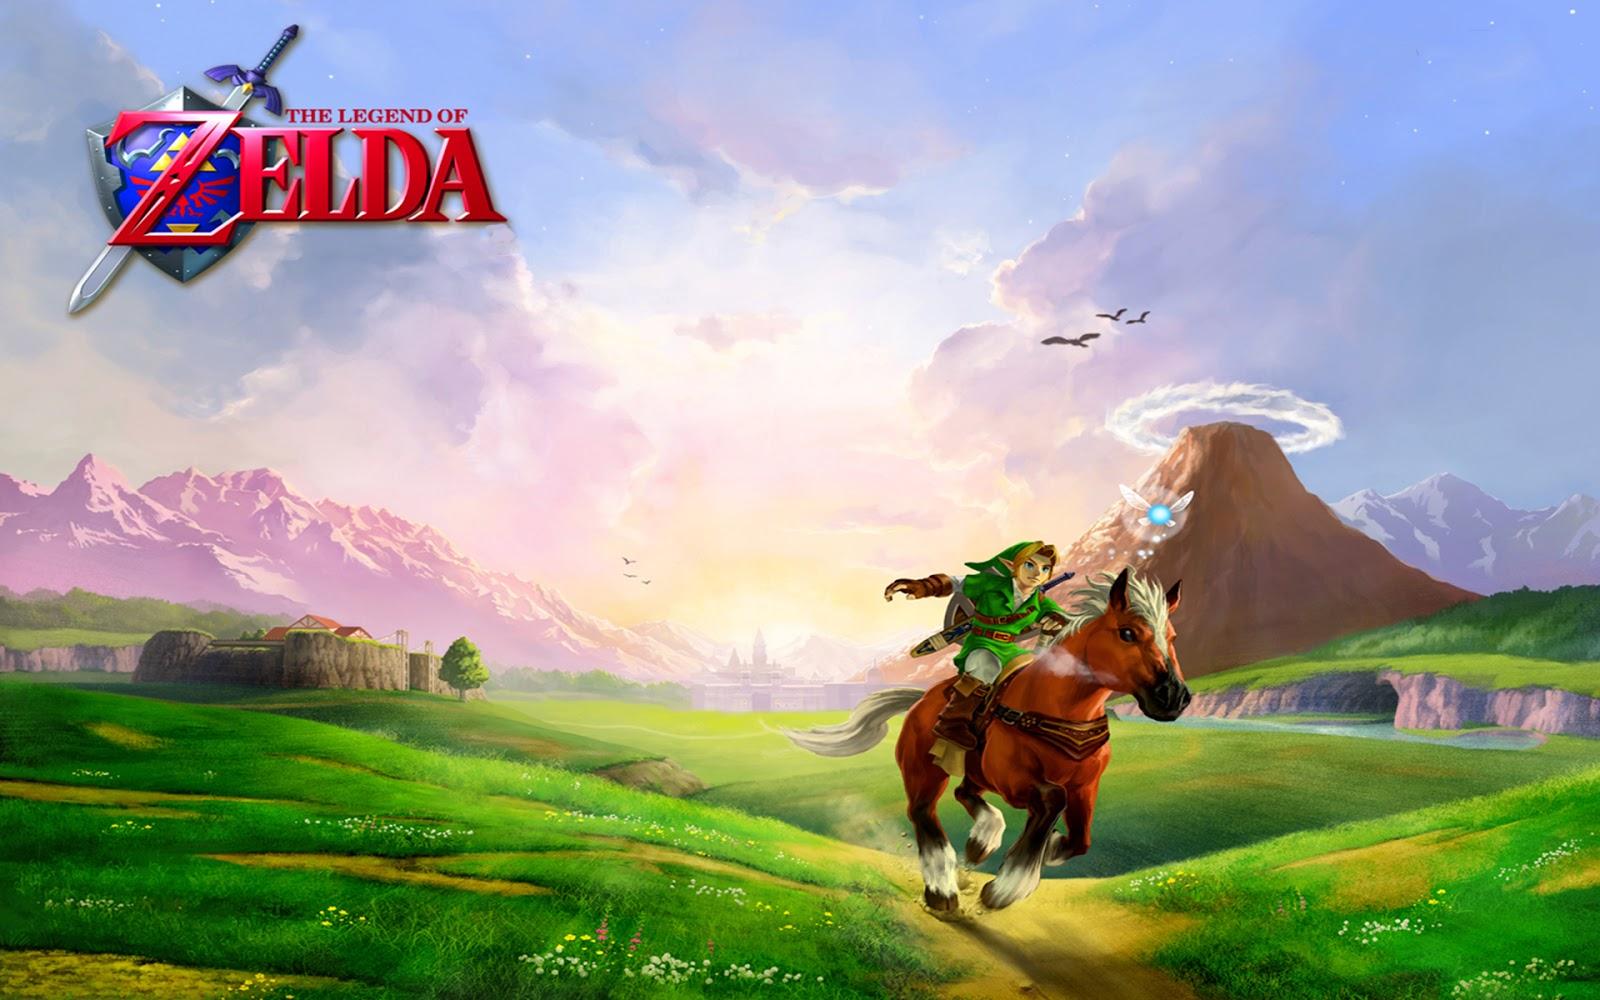 http://4.bp.blogspot.com/-q-uNQ86T-S0/UWNnA4tYjuI/AAAAAAAAfmA/_lQDXUAFGB8/s1600/Zelda.jpg